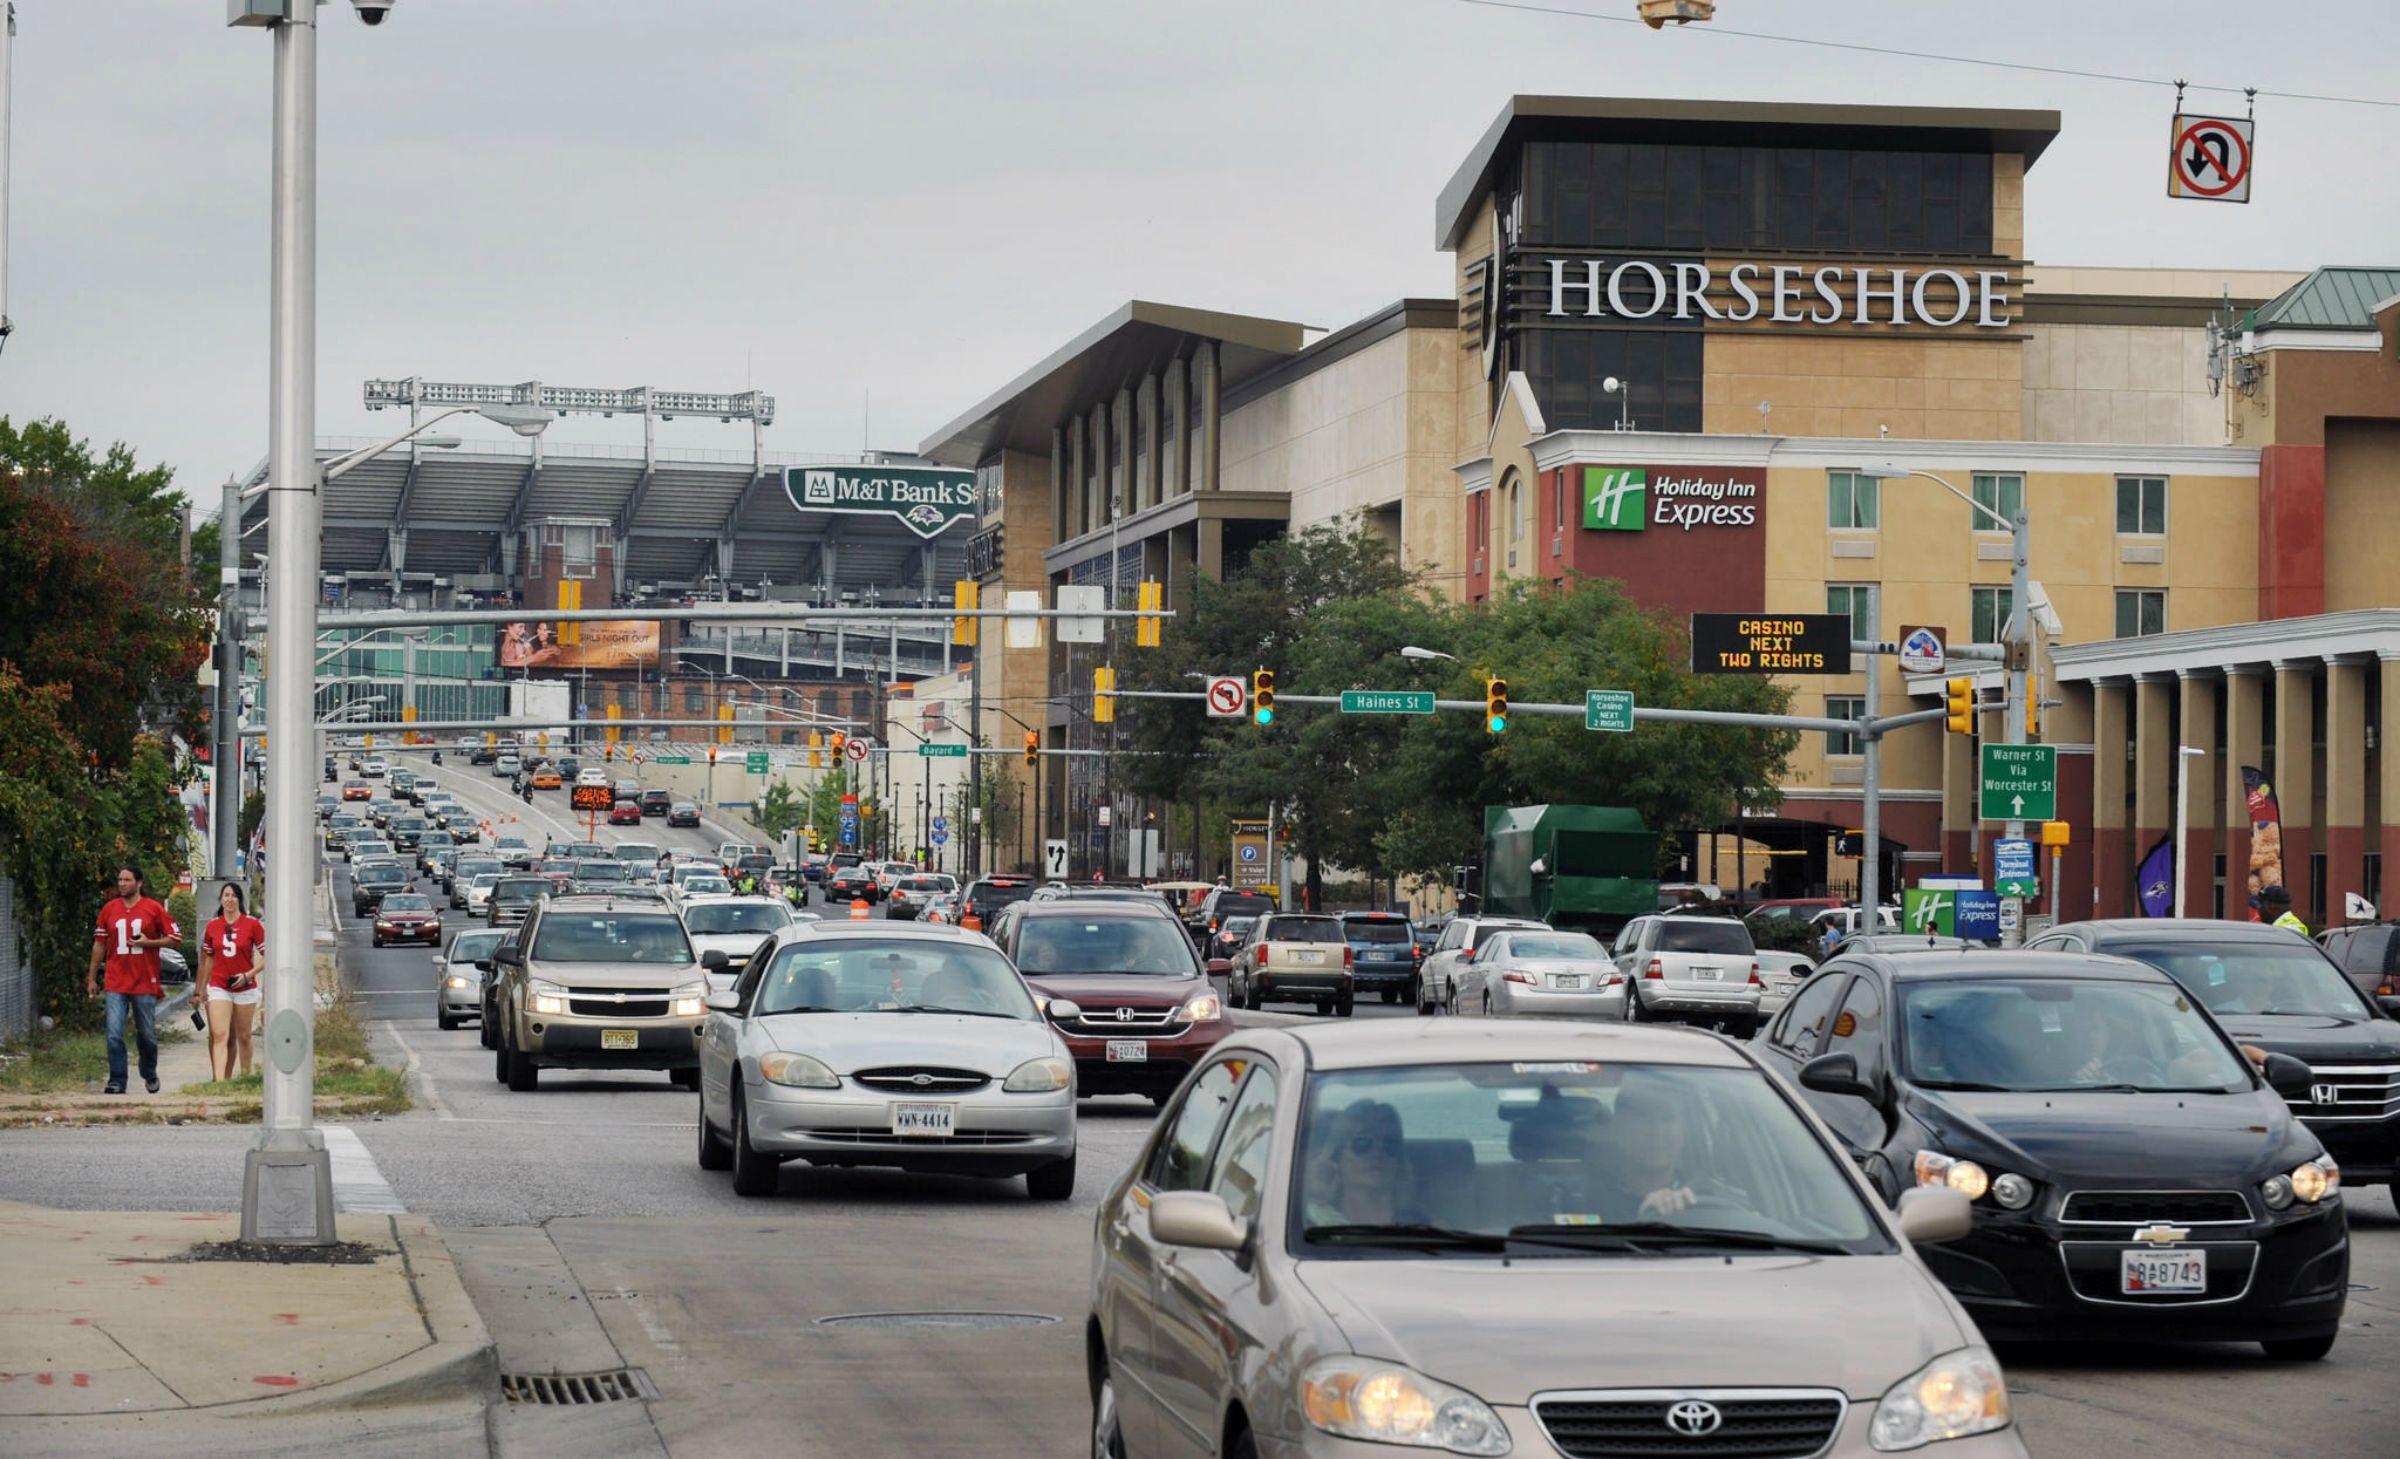 Horseshoe Baltimore casino Maryland revenue